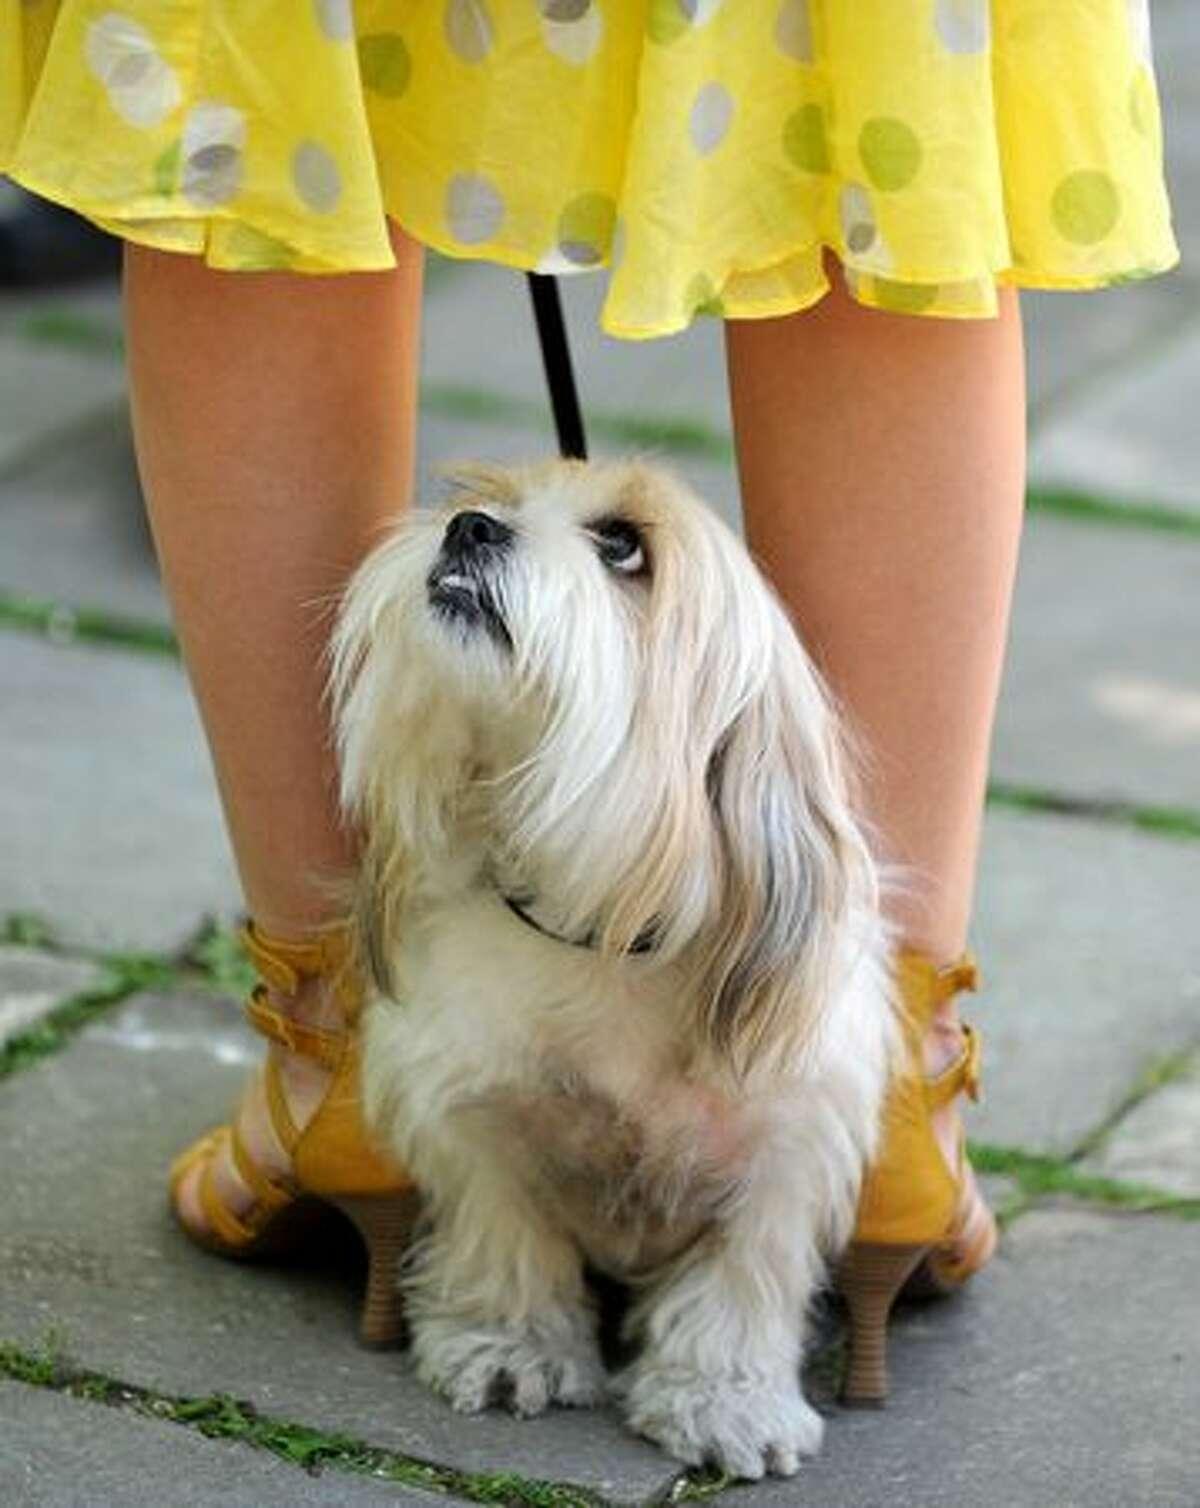 A dog and owner attend a dog show in Minsk central park, in Minsk, Belarus.